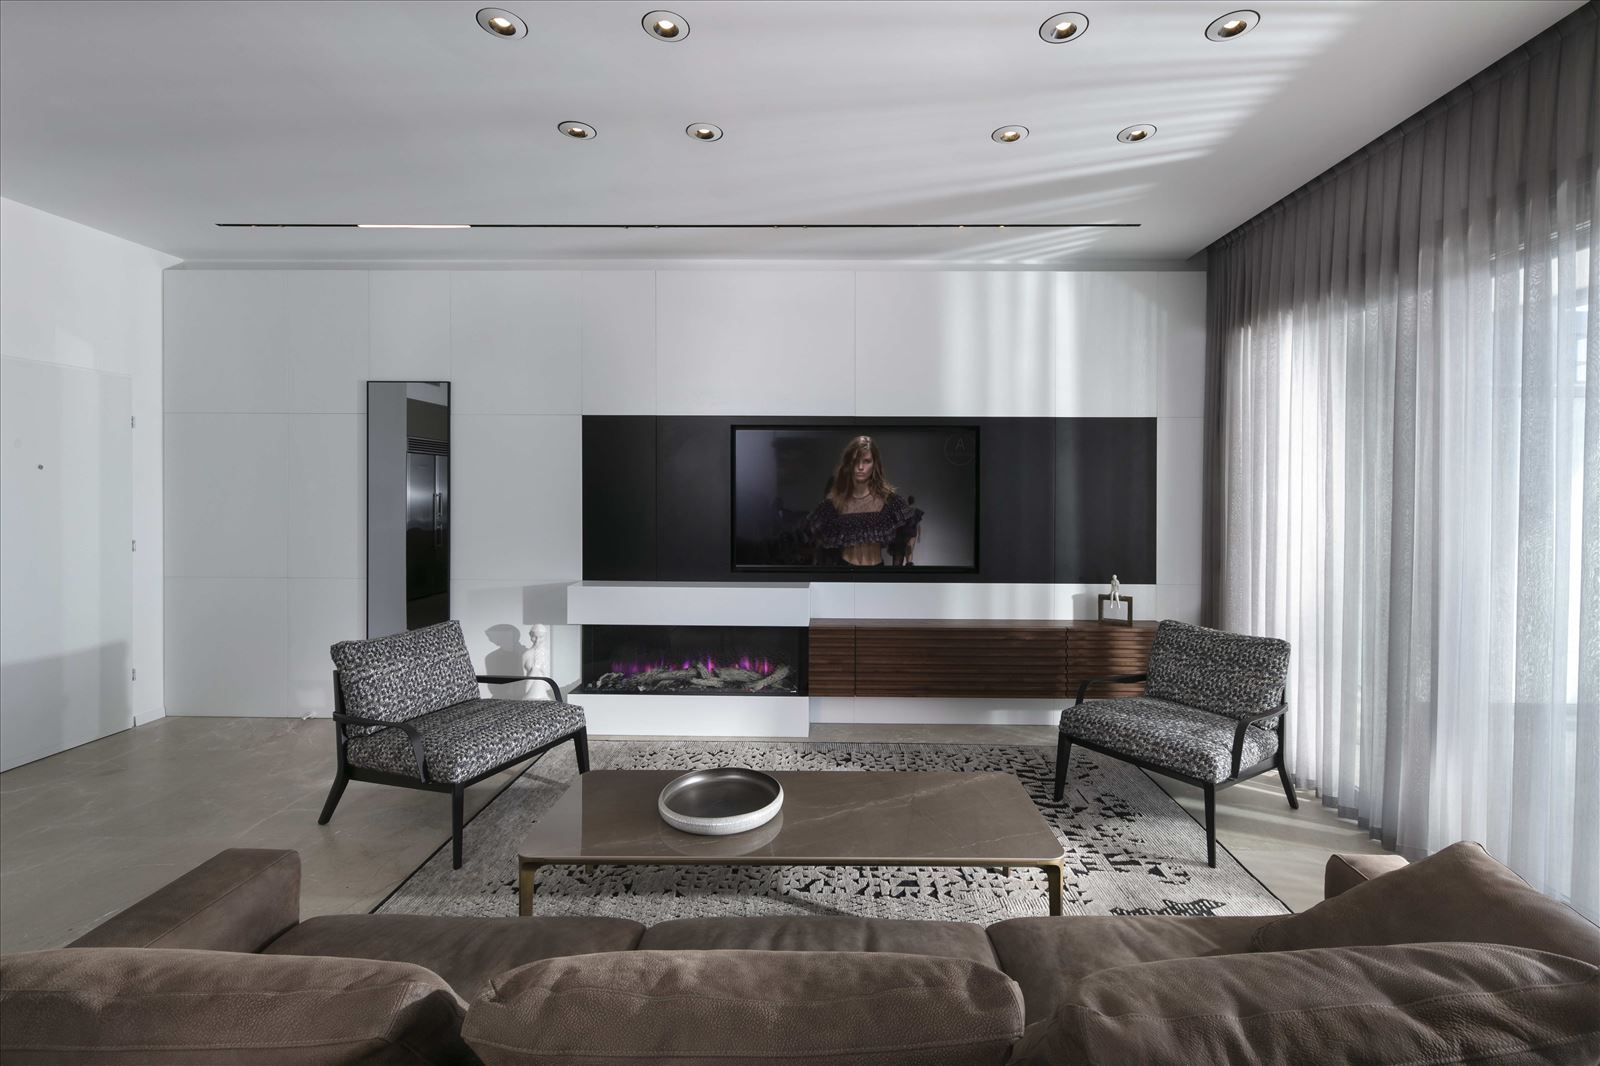 Private home - Herzliya תאורת הסלון בבית על ידי דורי קמחי